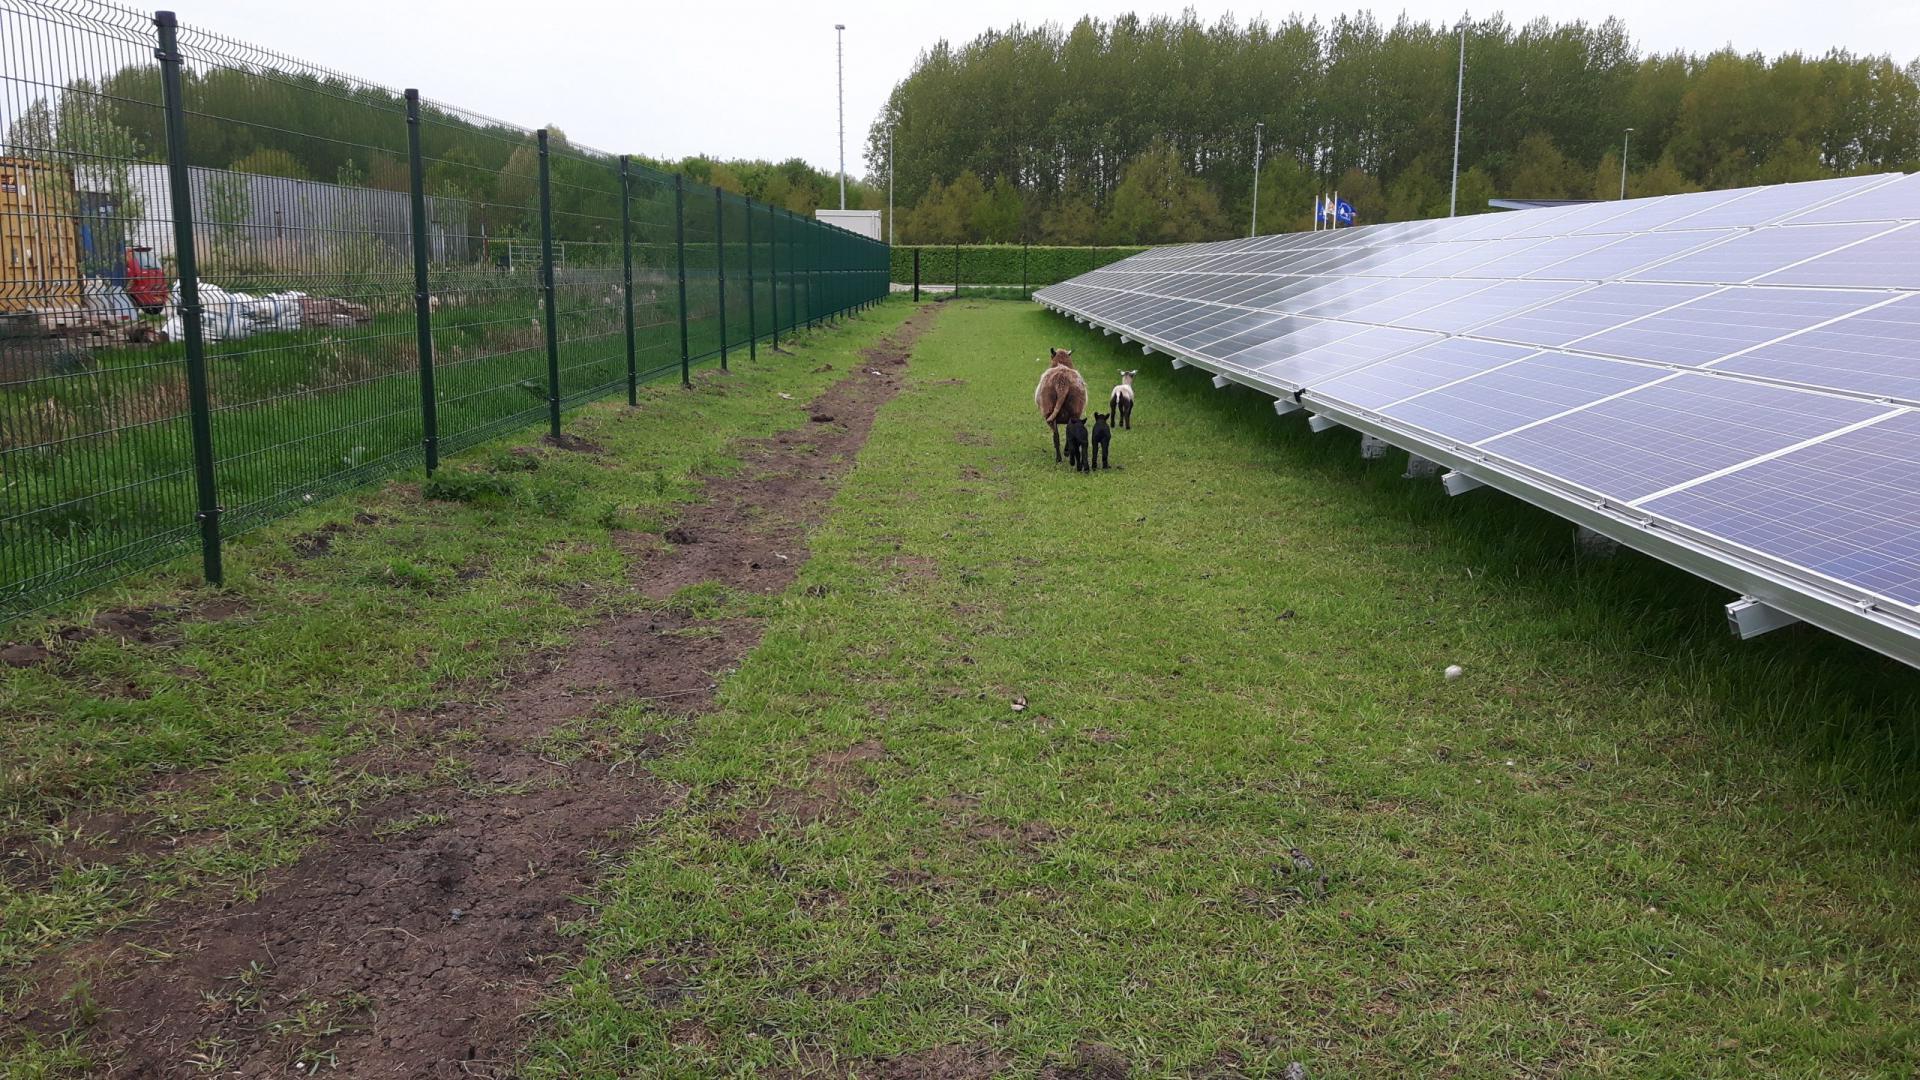 Solarpark Galecop